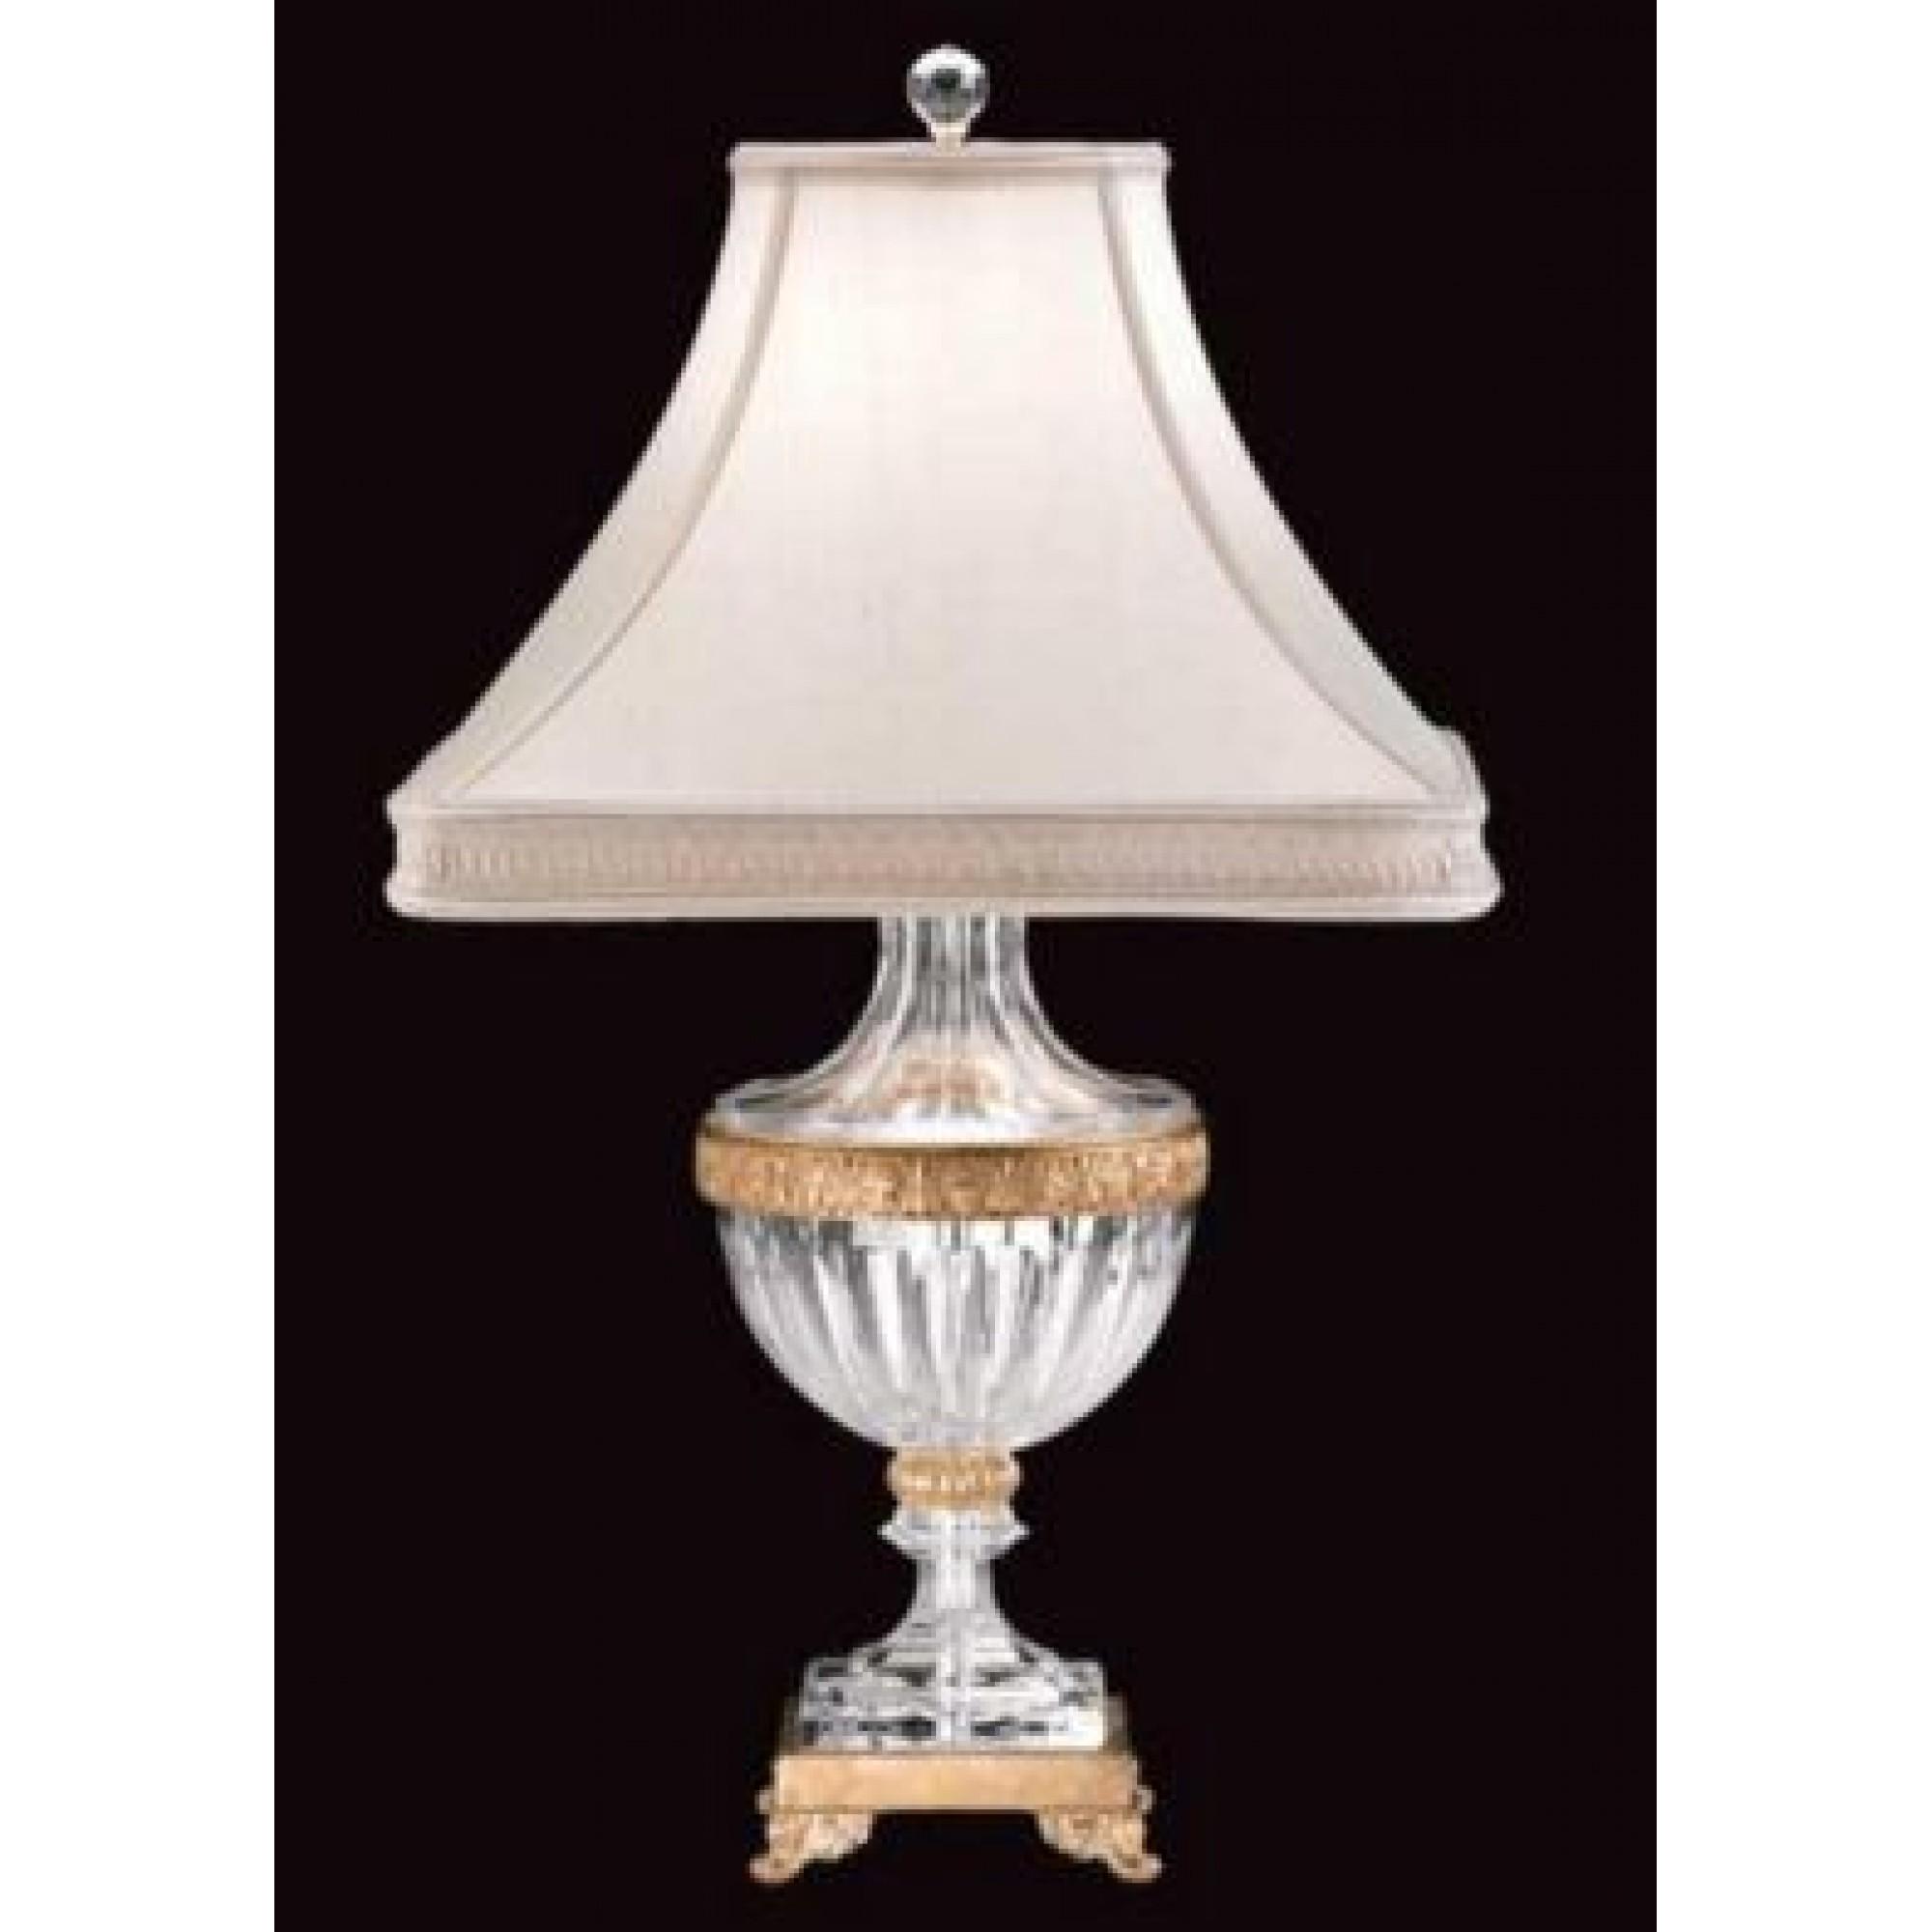 LUXOR TABLE LAMP - Klasik -  SCHONBEK